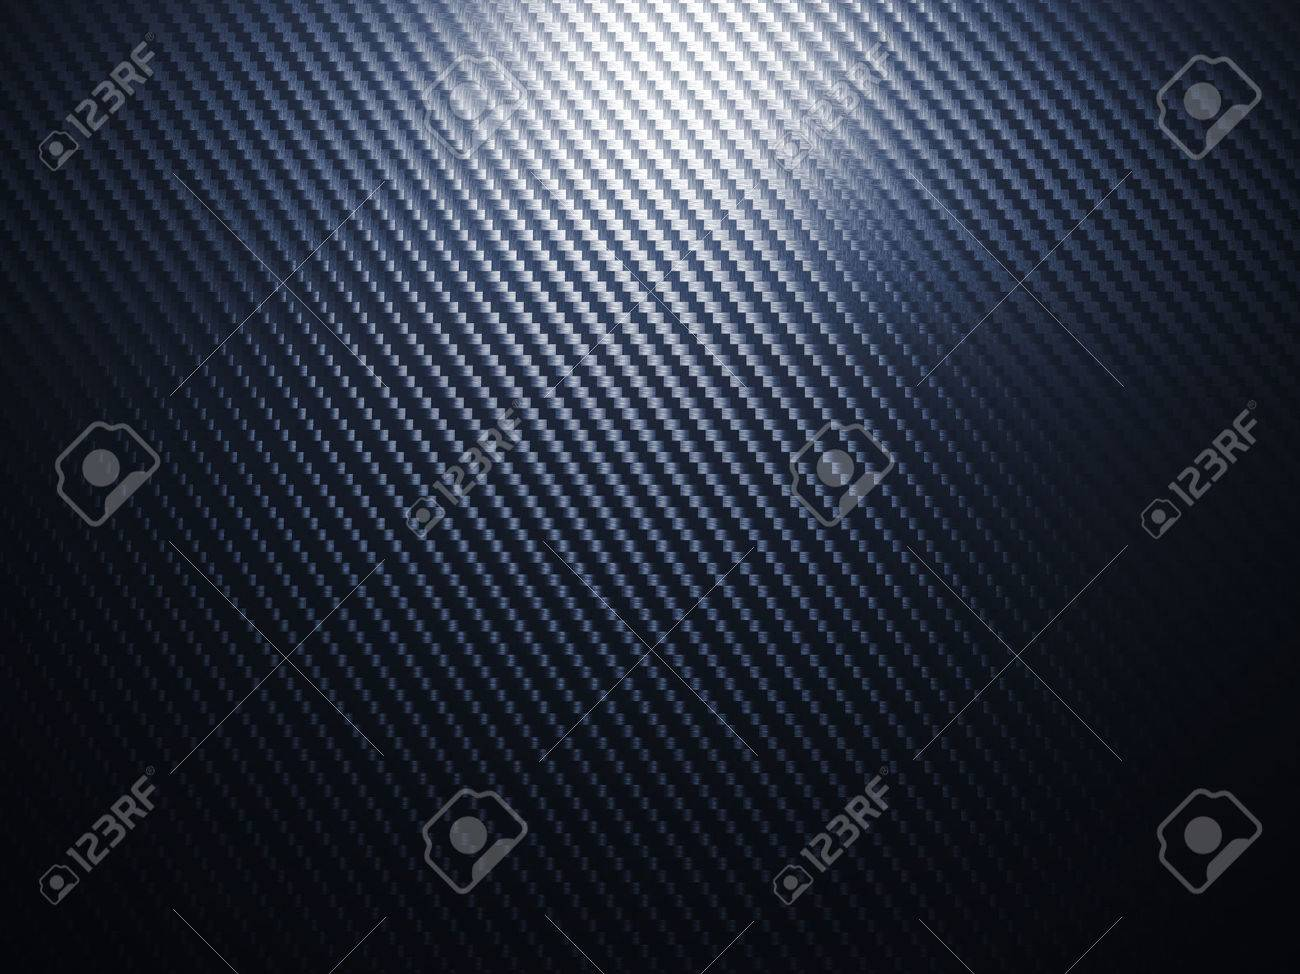 3d image of classic carbon fiber texture Stock Photo - 42874292